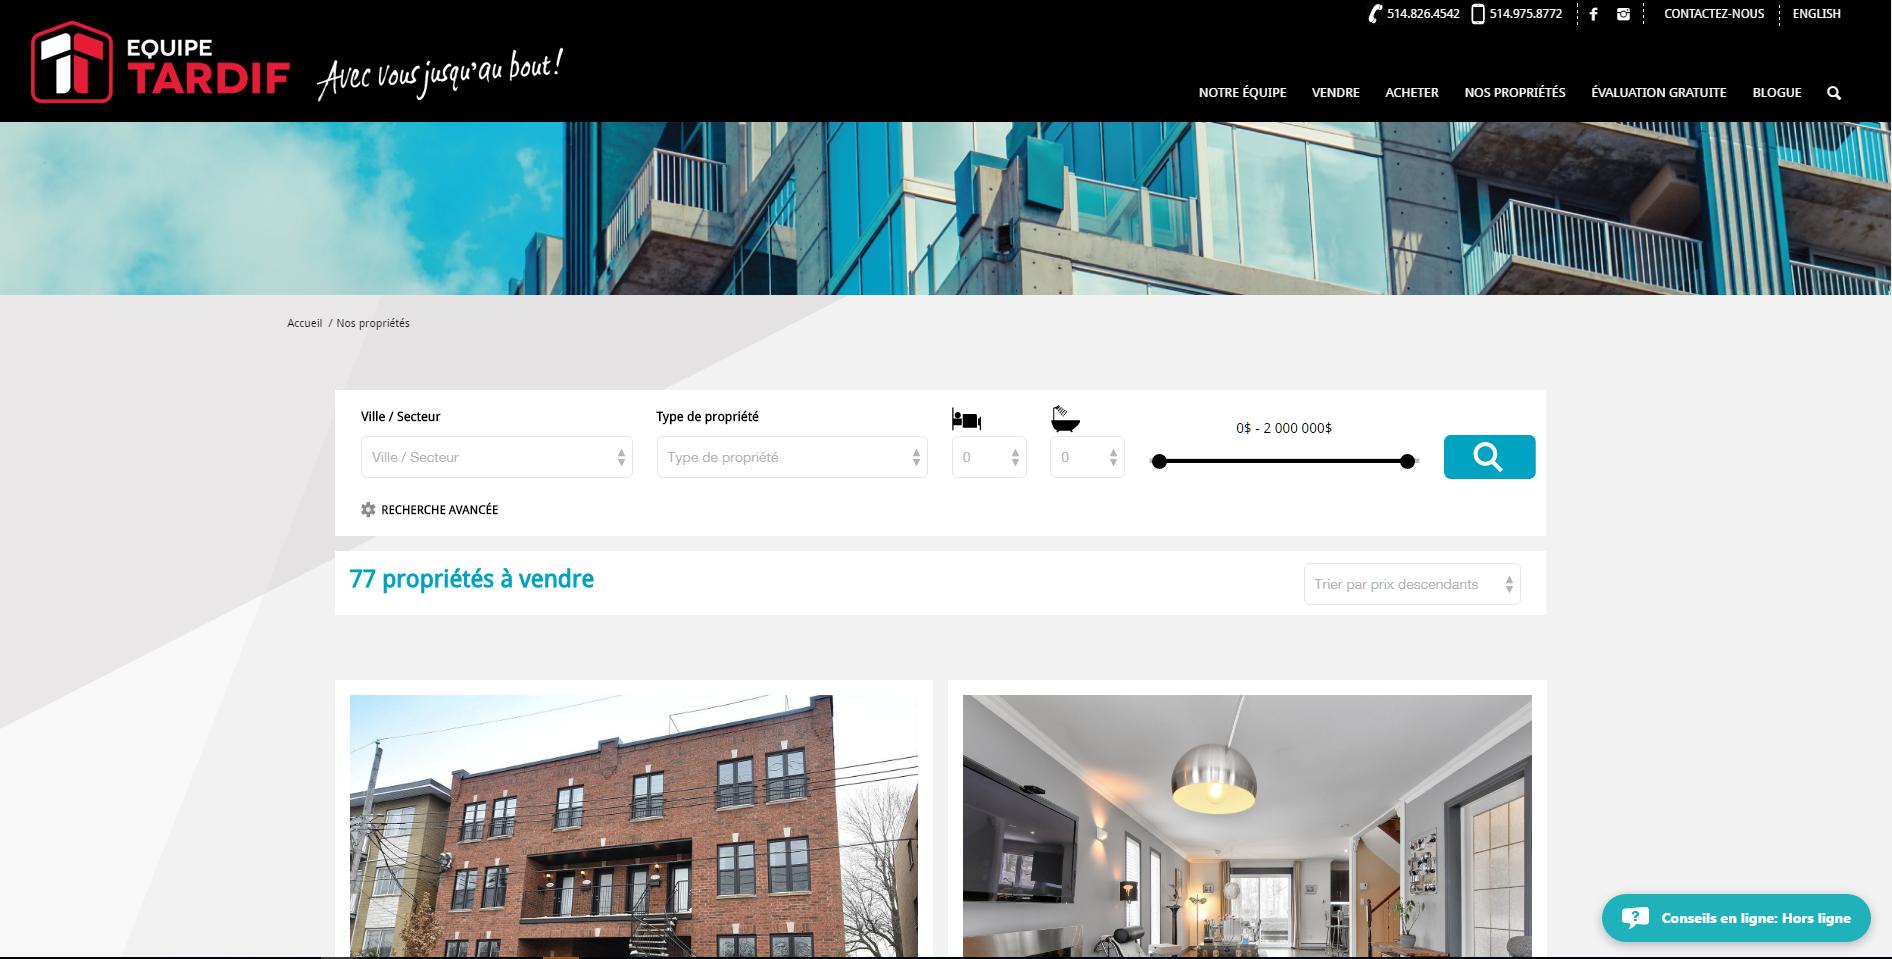 Équipe Tardif - Property search